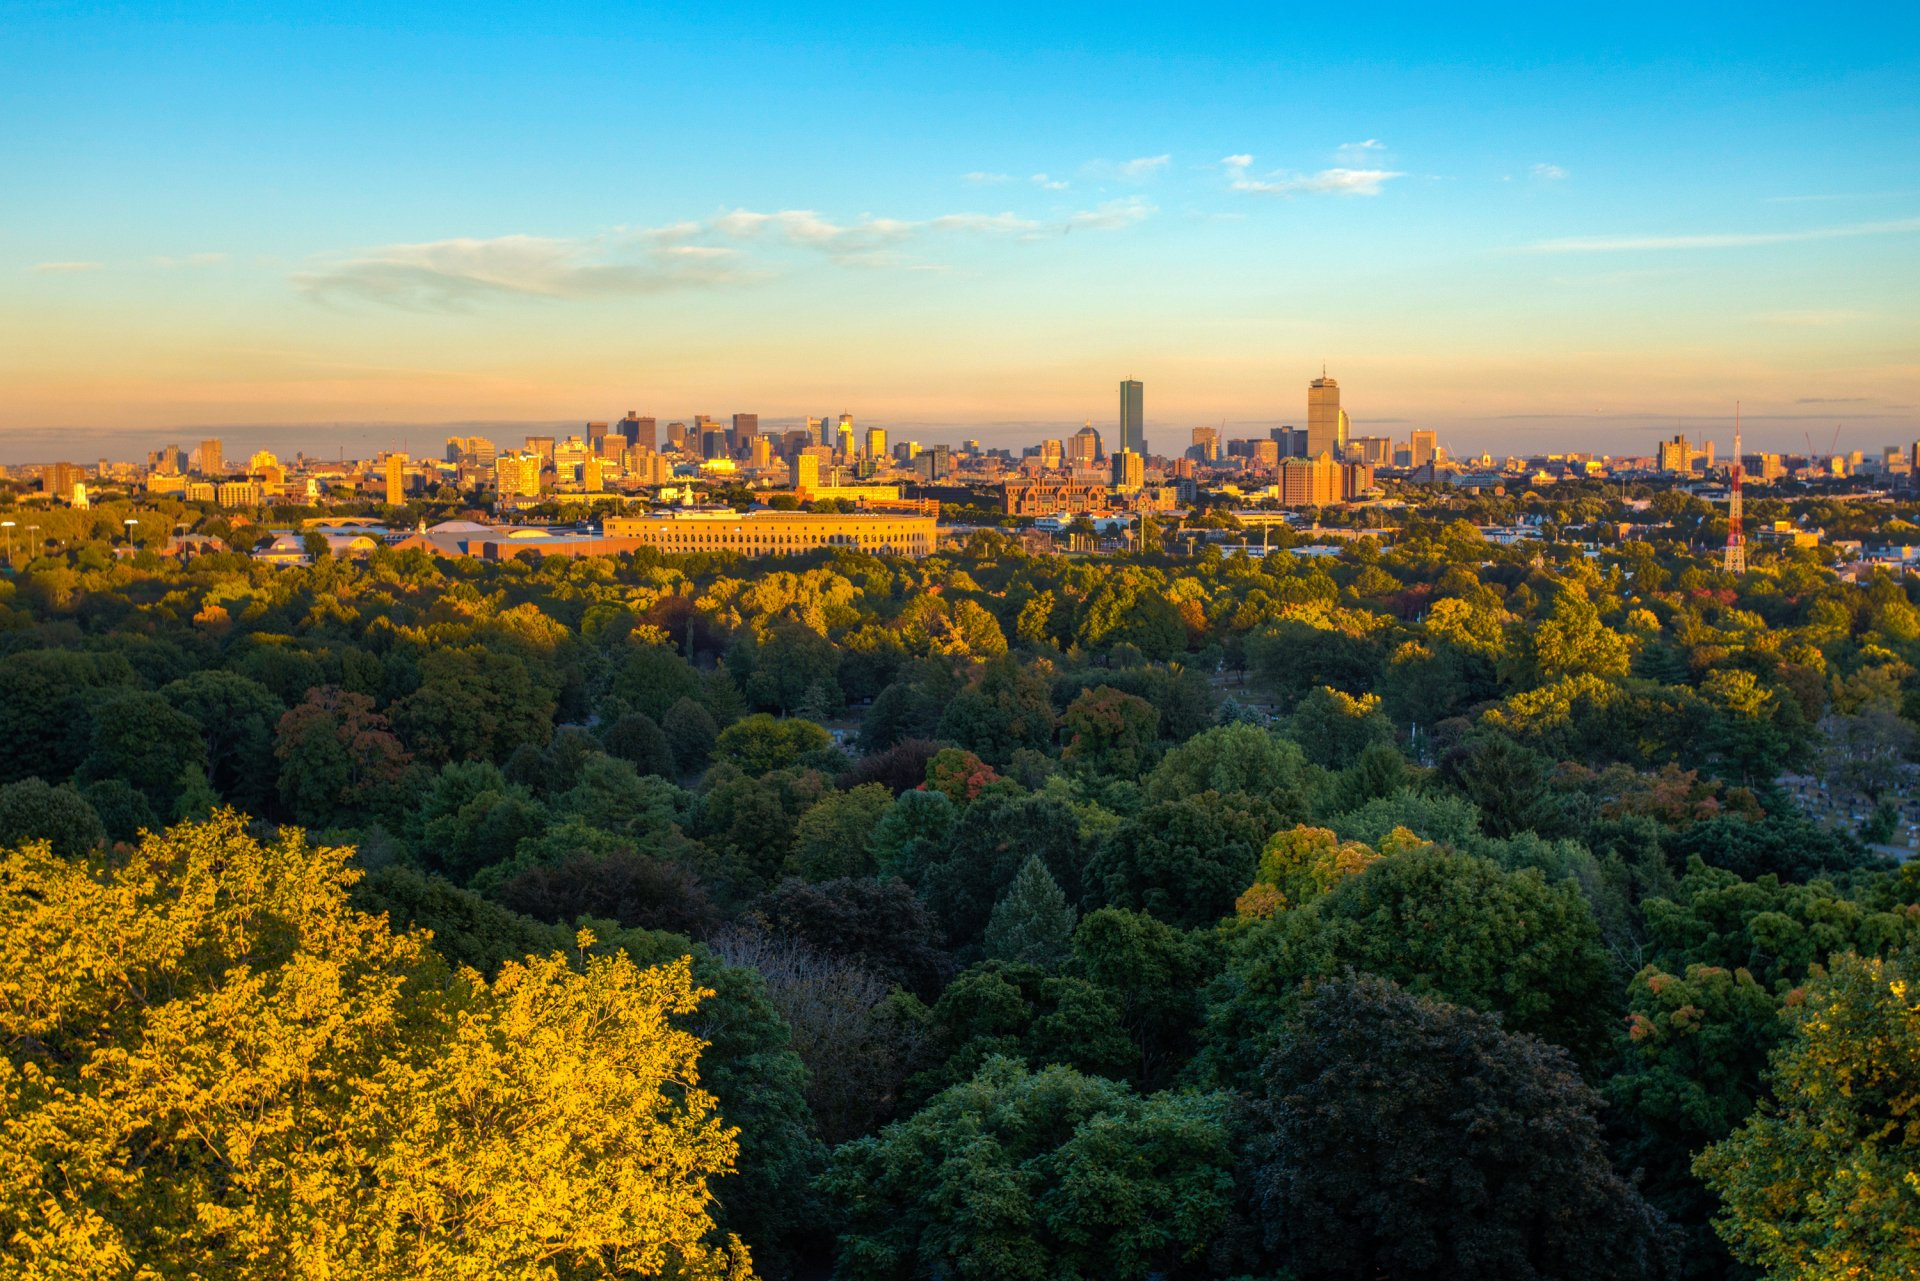 Man Made - Boston  USA City Landscape Tree Horizon Wallpaper